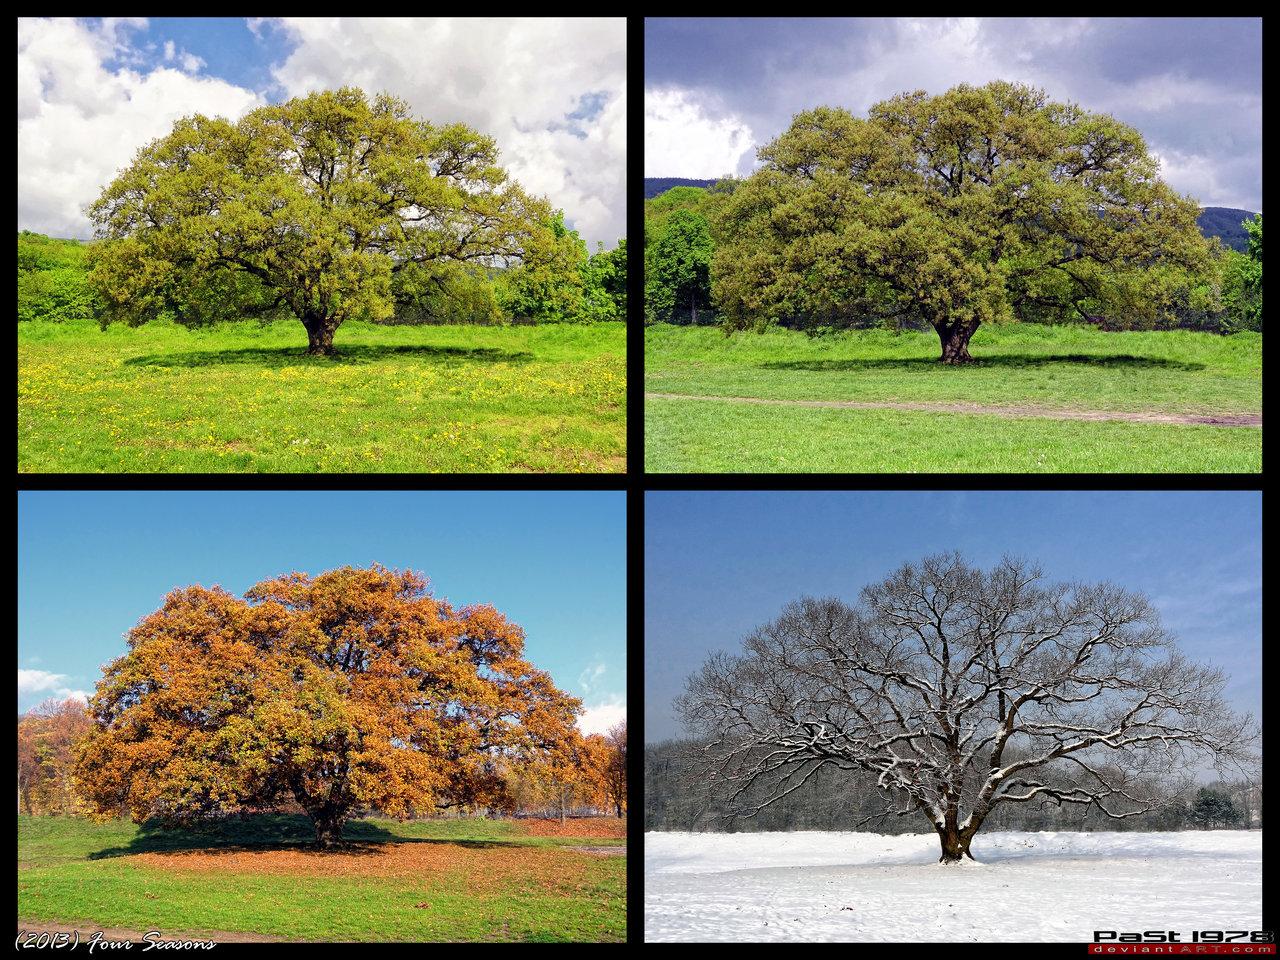 Bir Y Lda 4 Mevsim Yok Ye Il Olan Ne Varsa